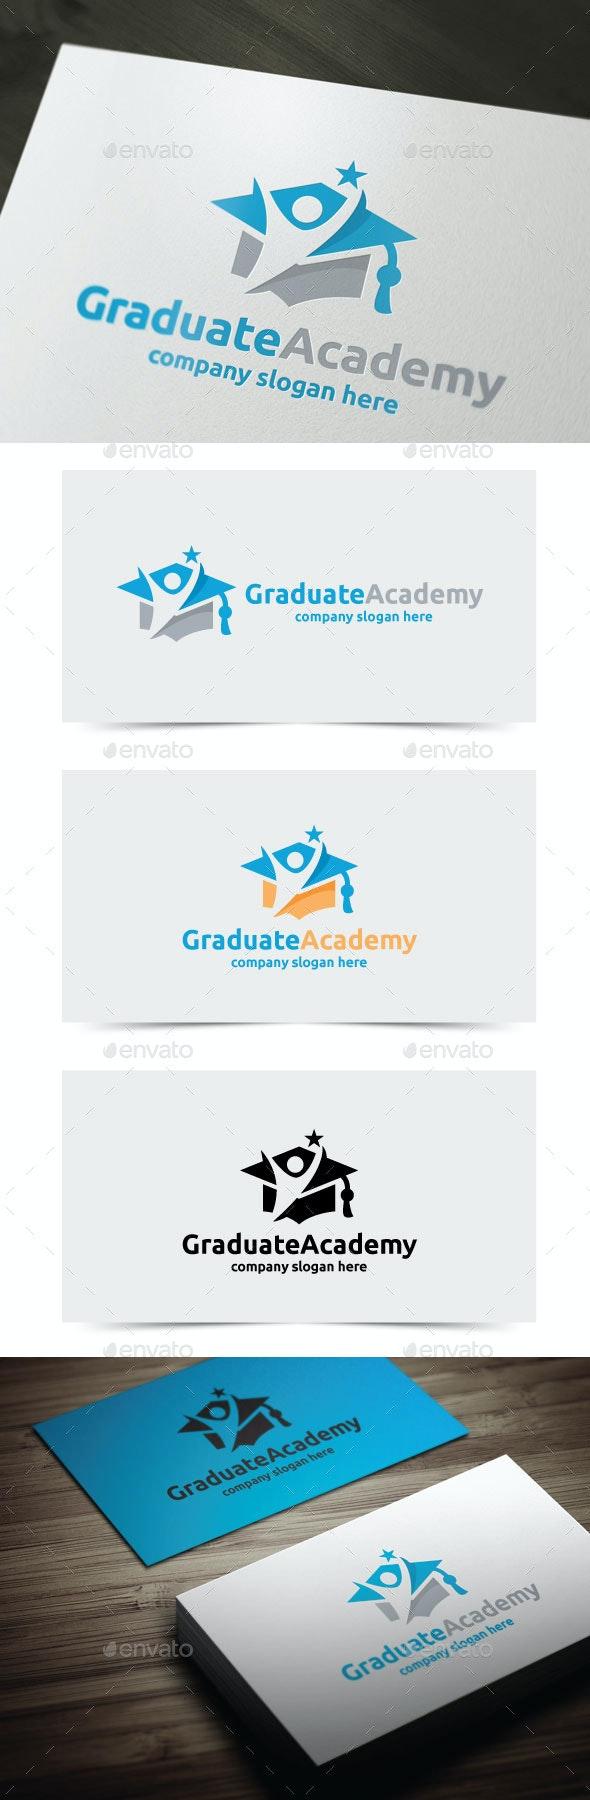 Graduate Academy - College Logo Templates